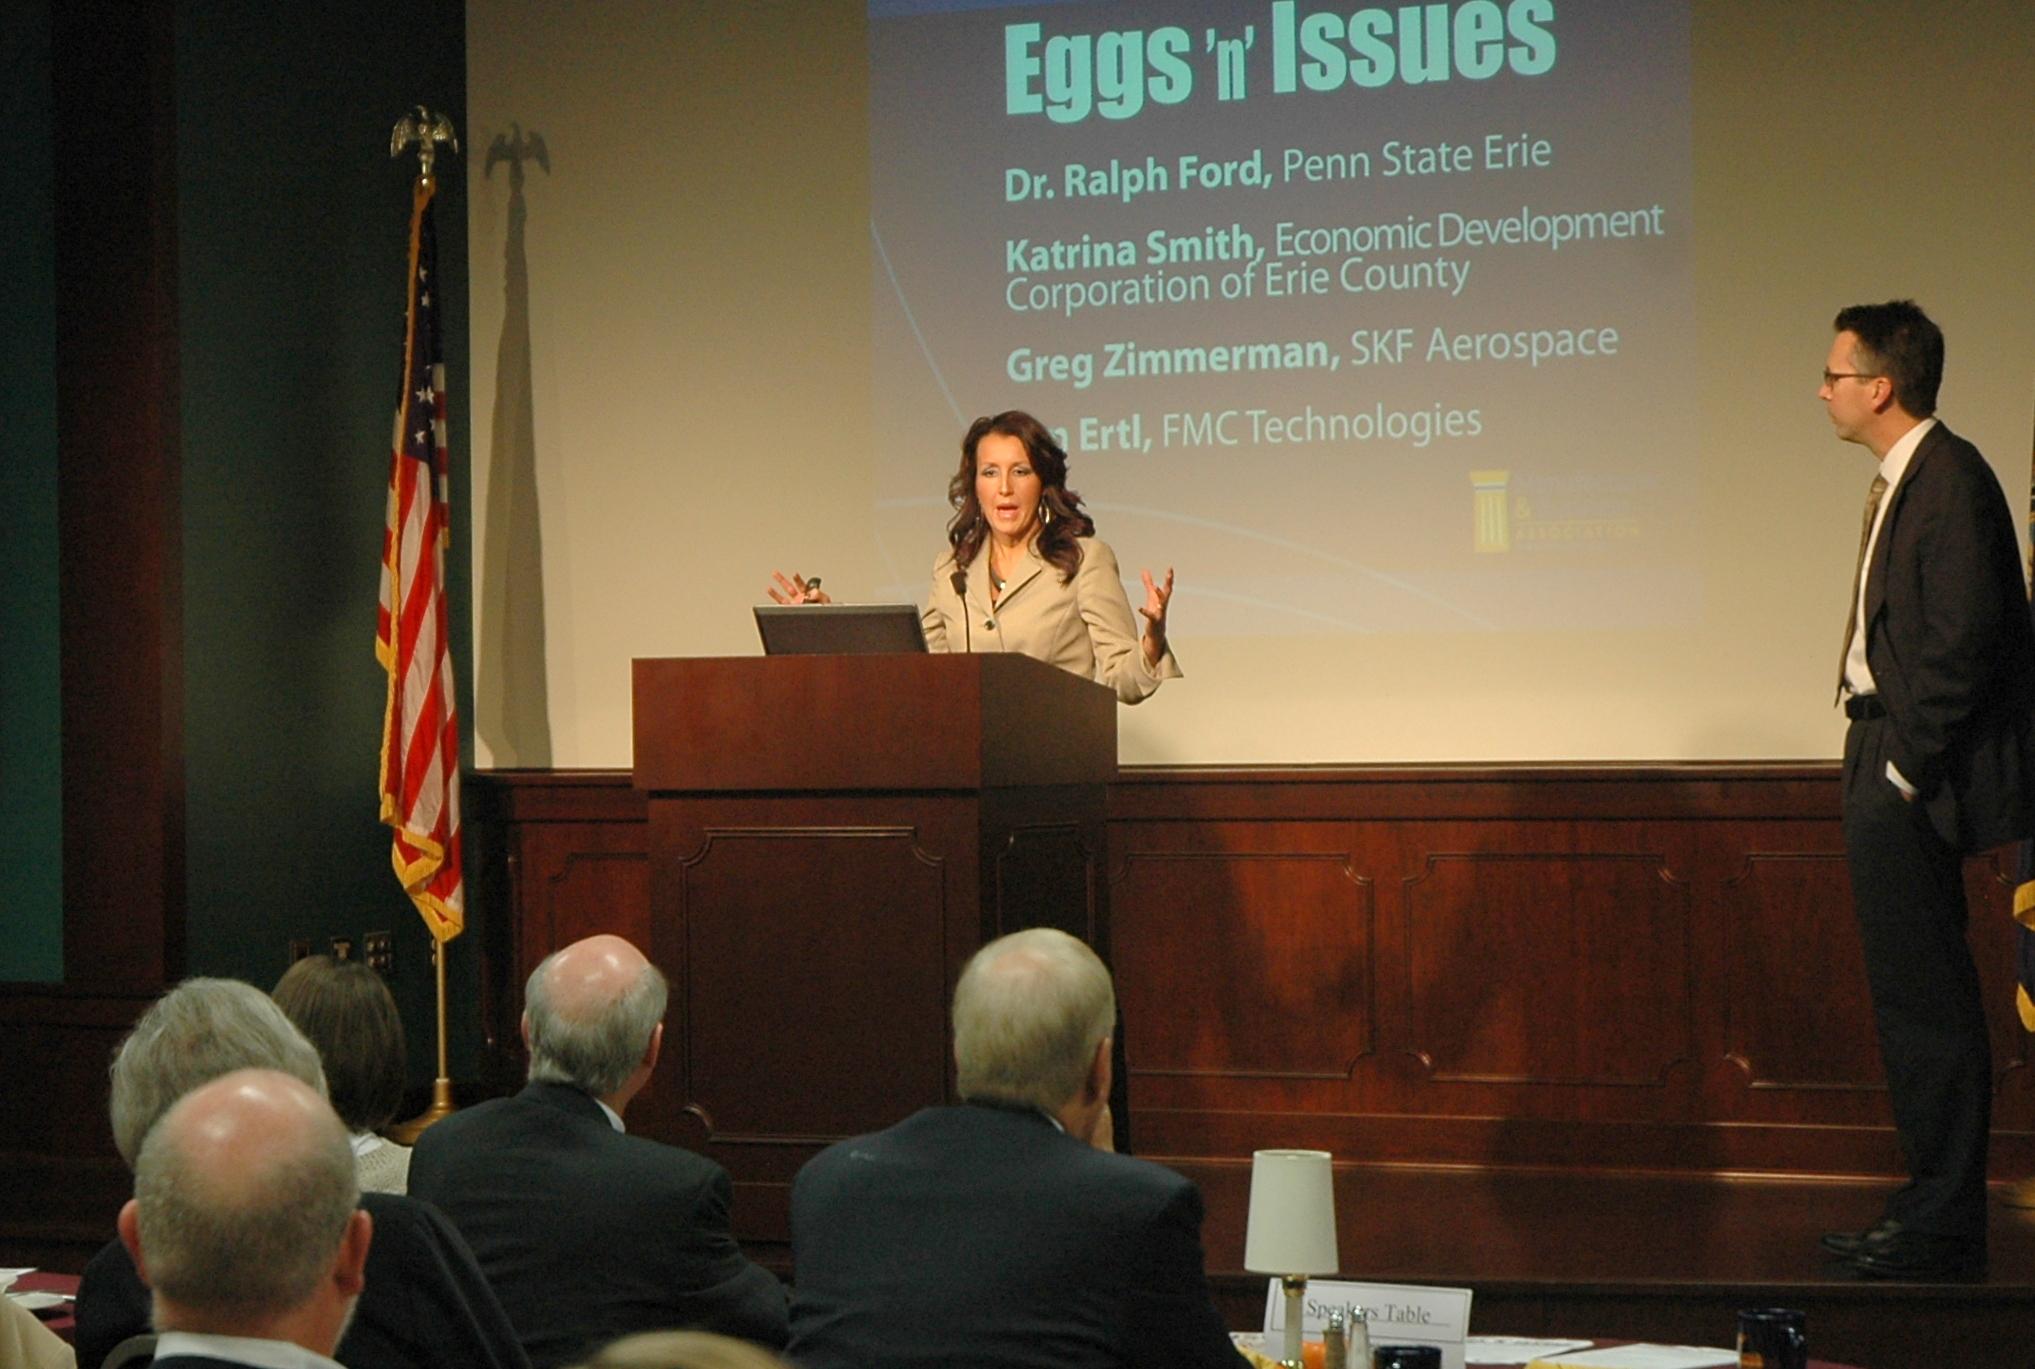 october 2013 eggs 'n' issues